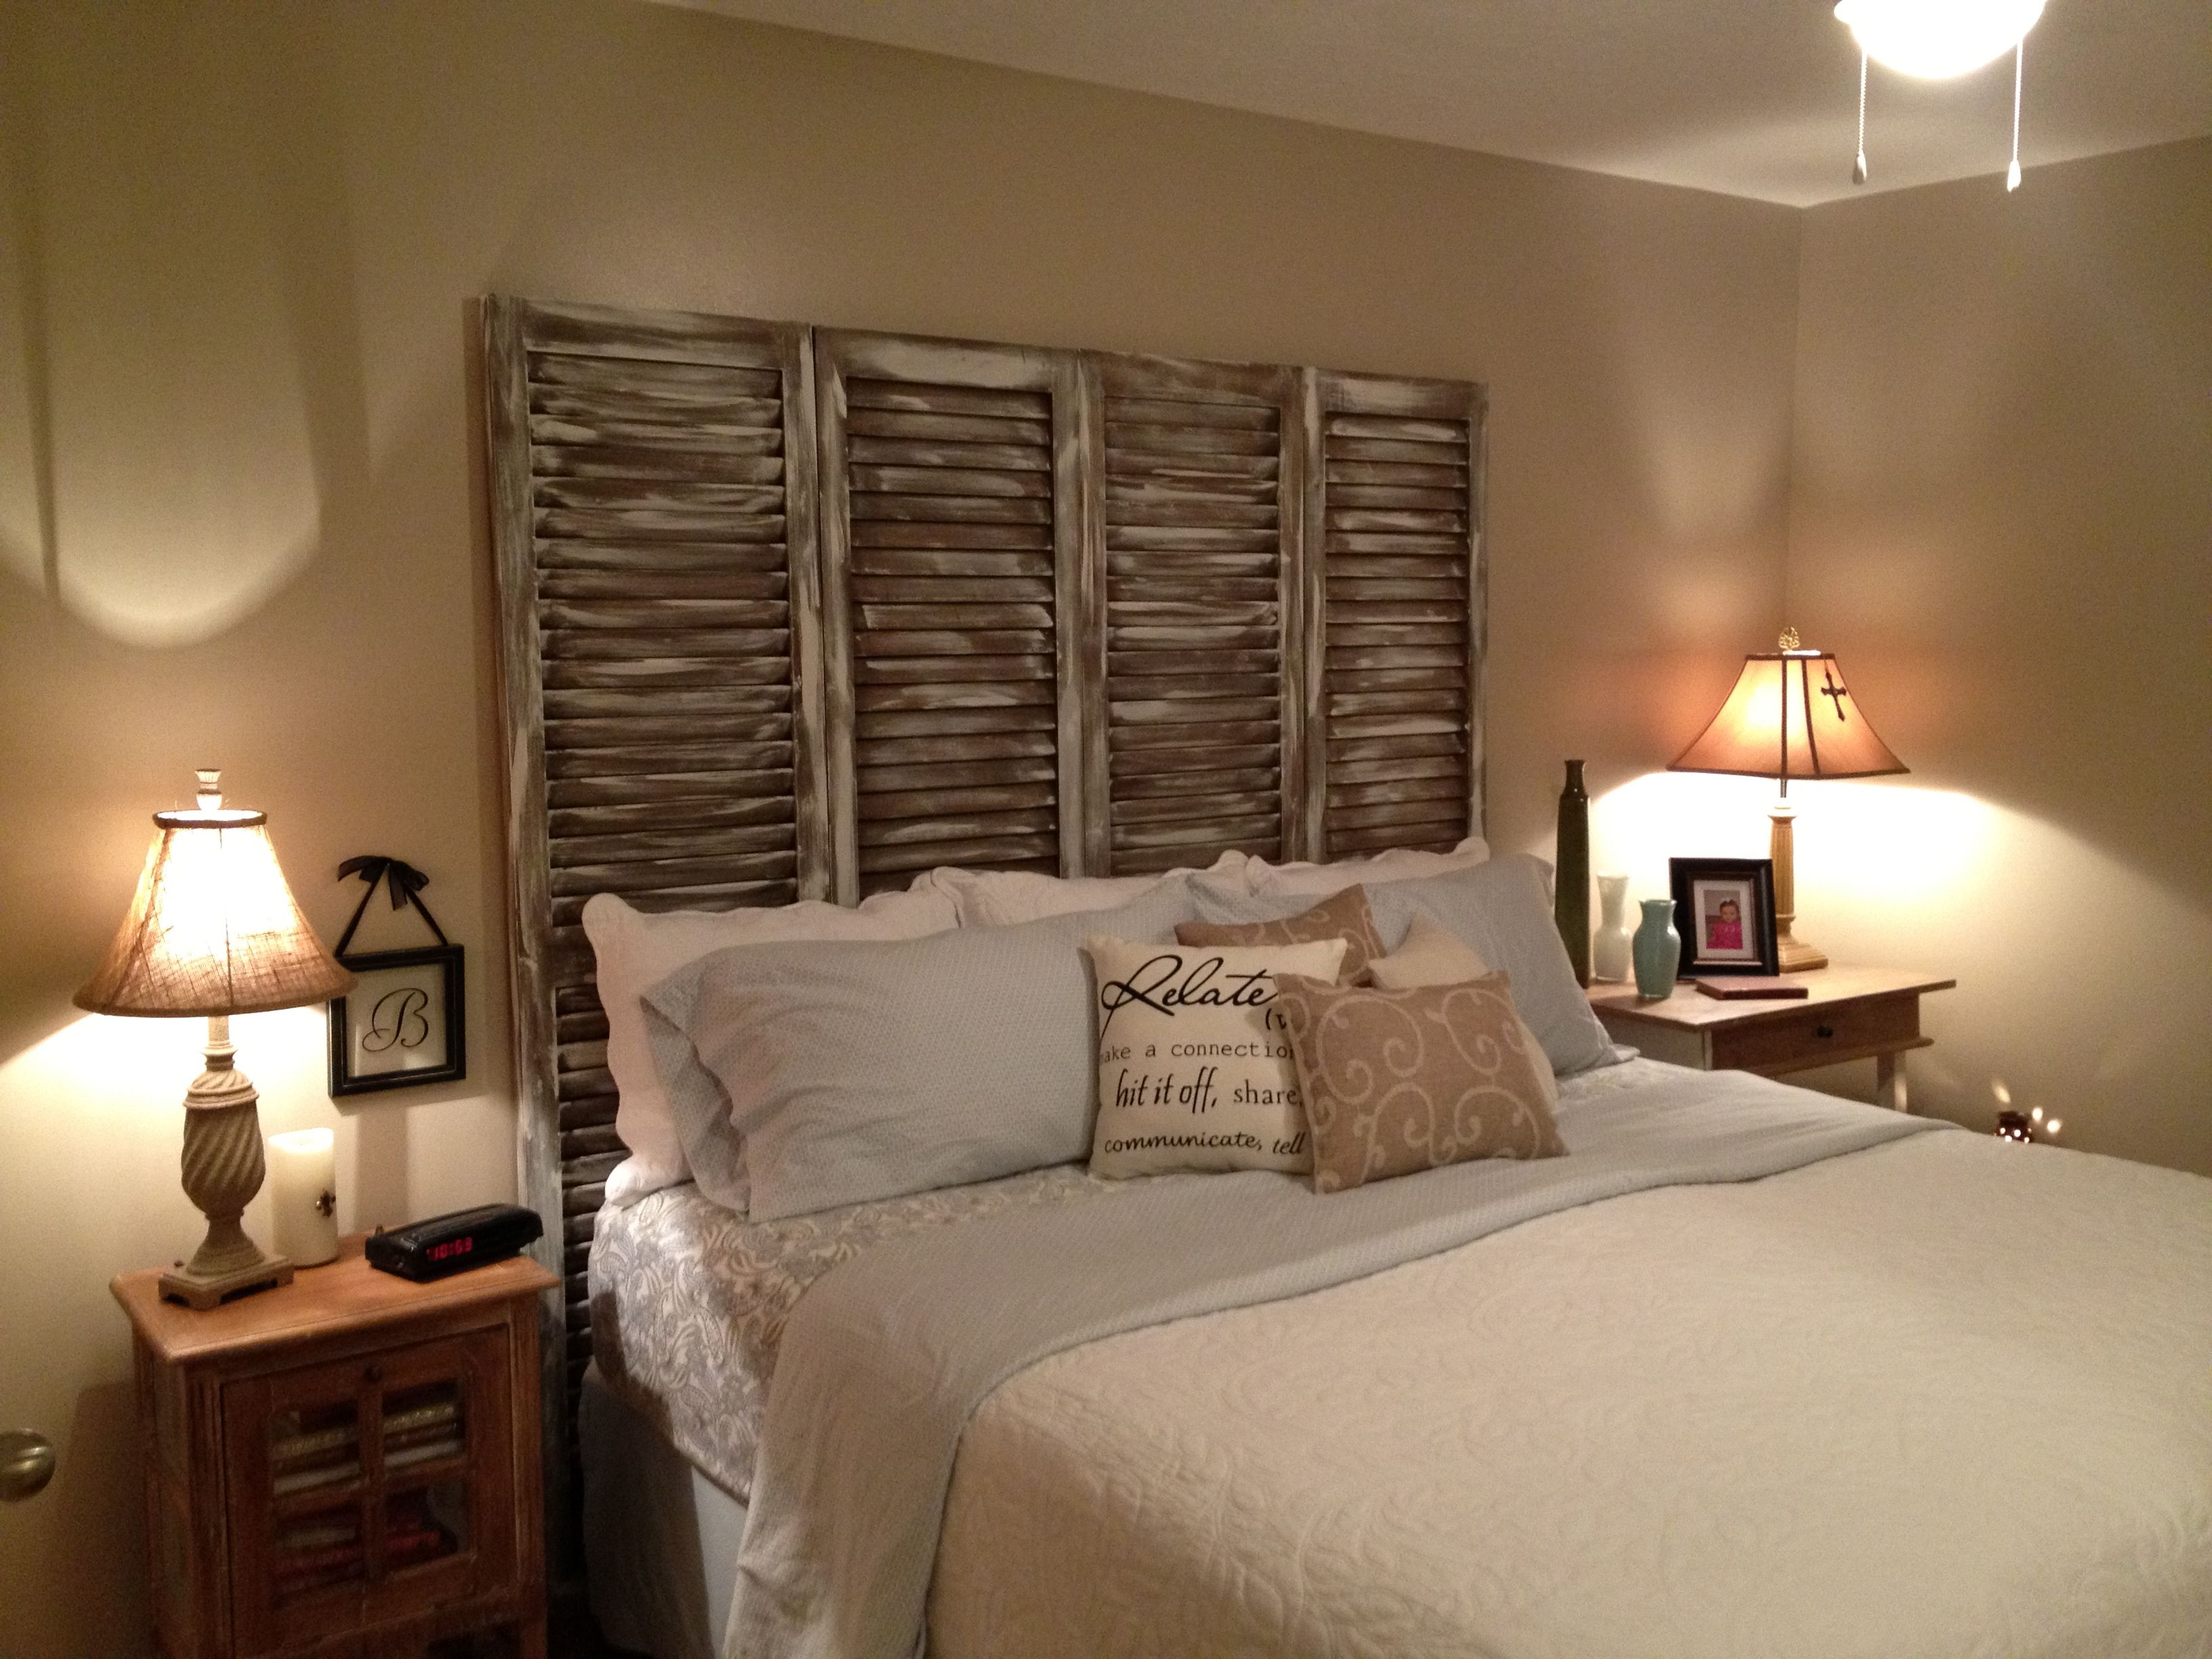 Bedroom home decor bedroom repurposed headboard home decor